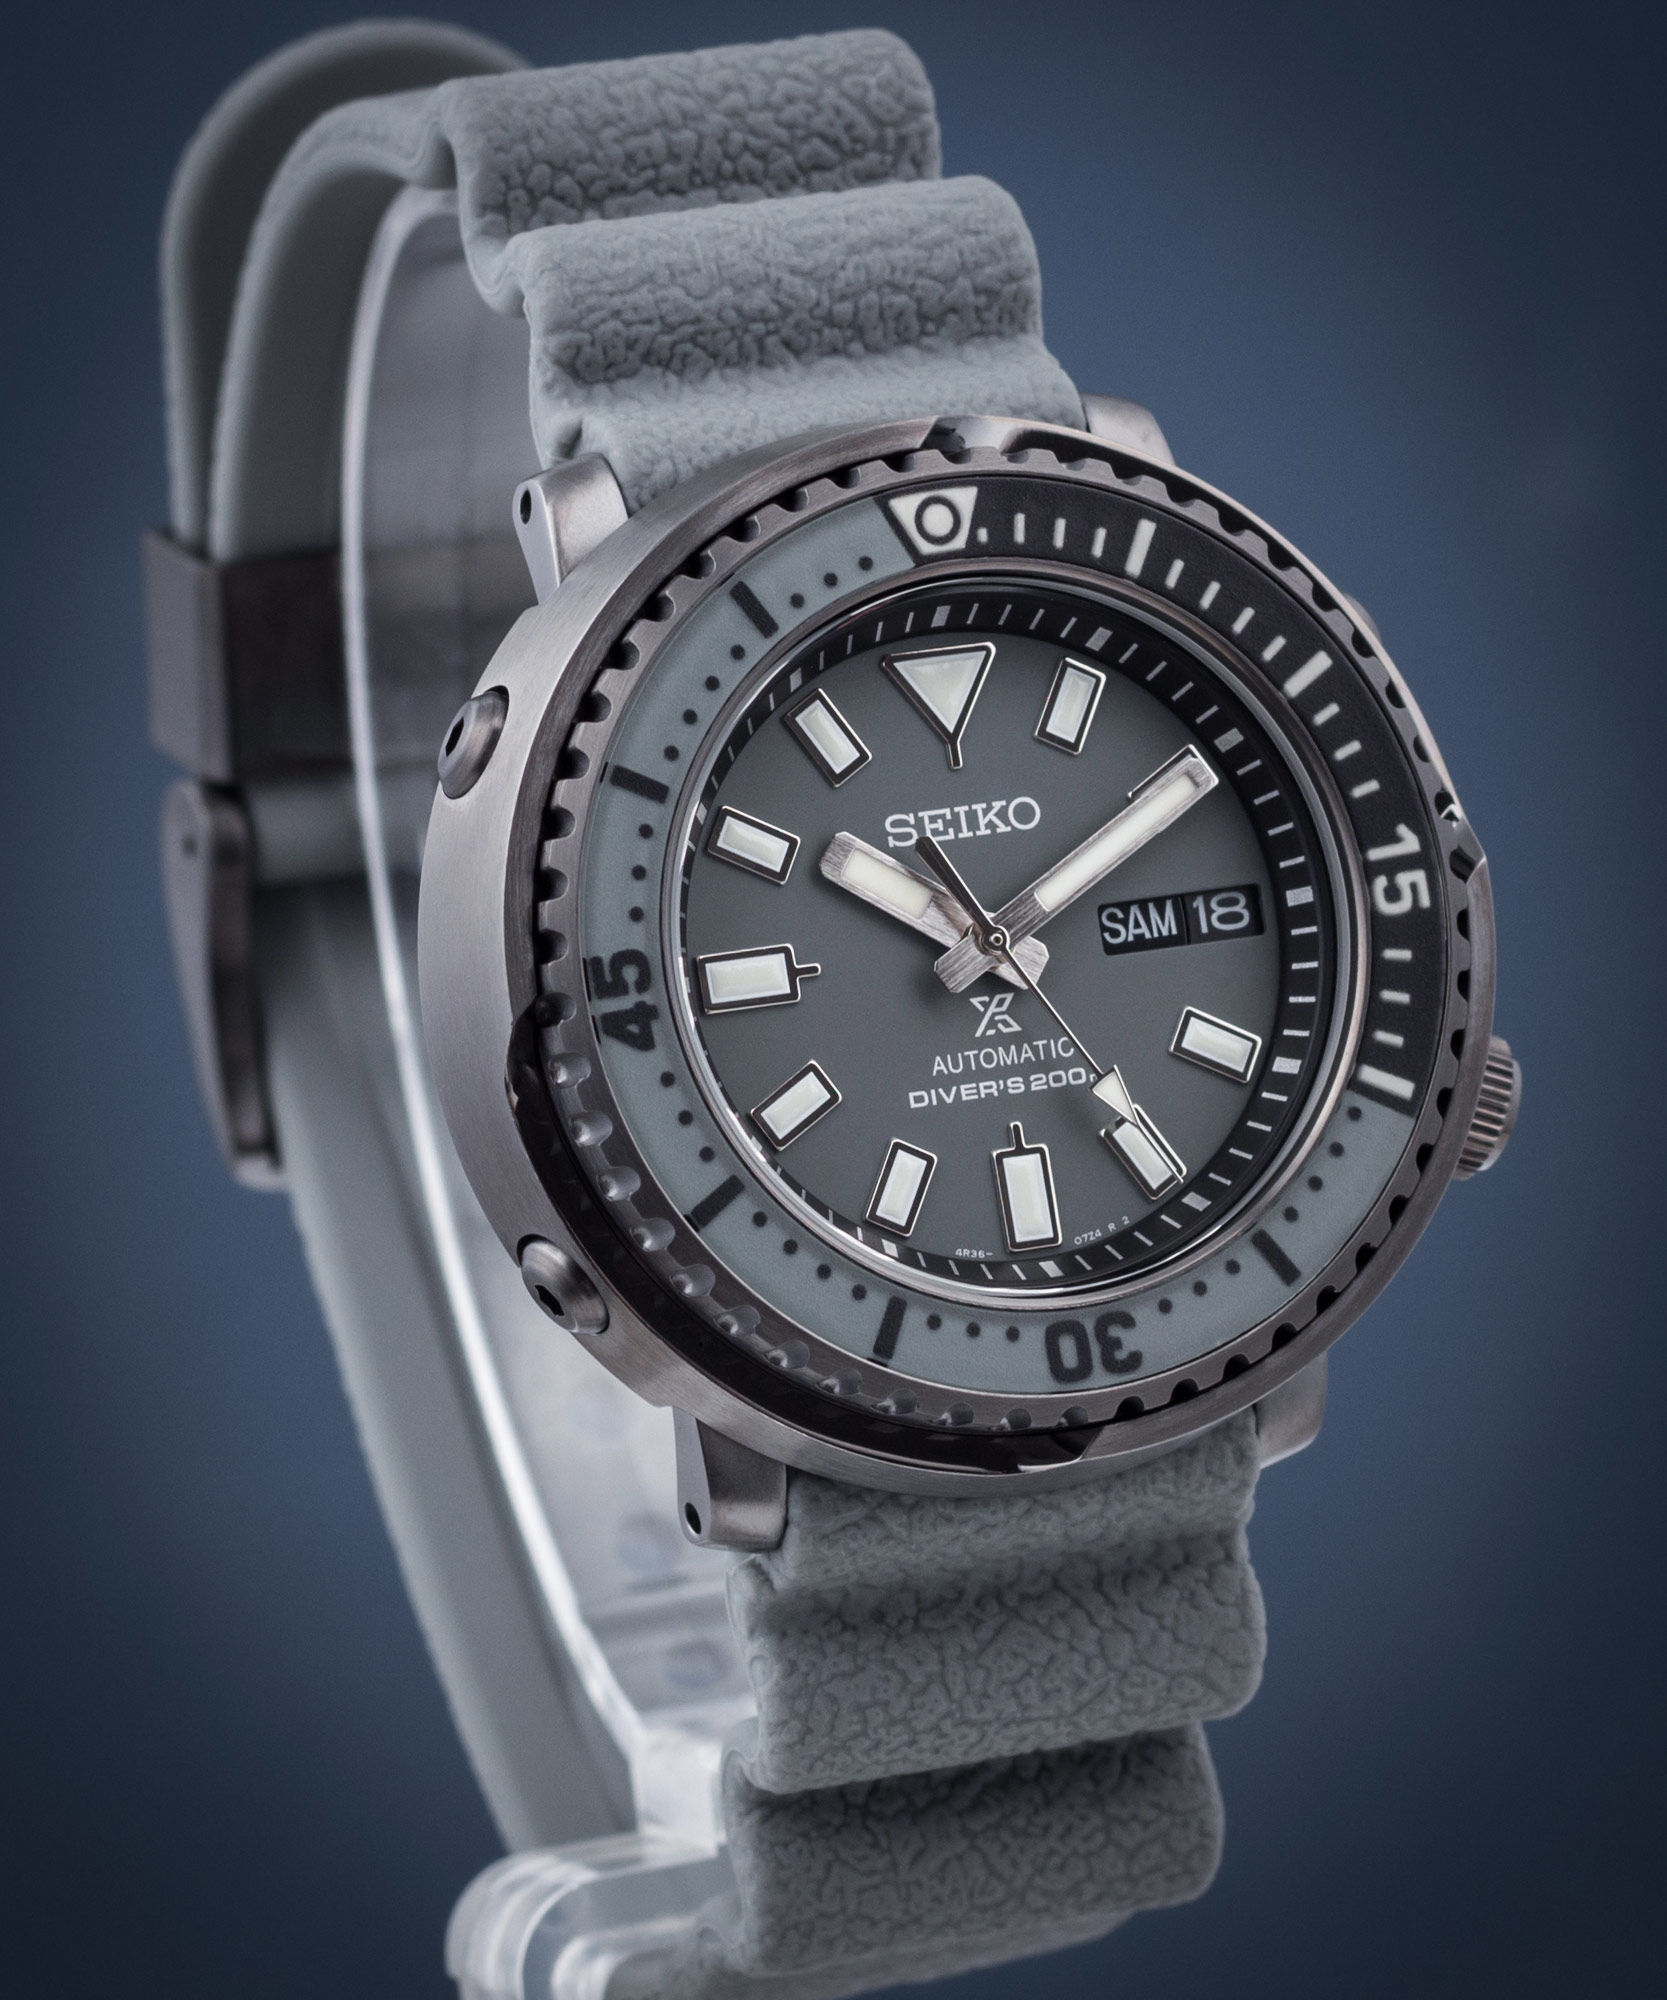 Zegarek męski Seiko Prospex Diver''s Automatic